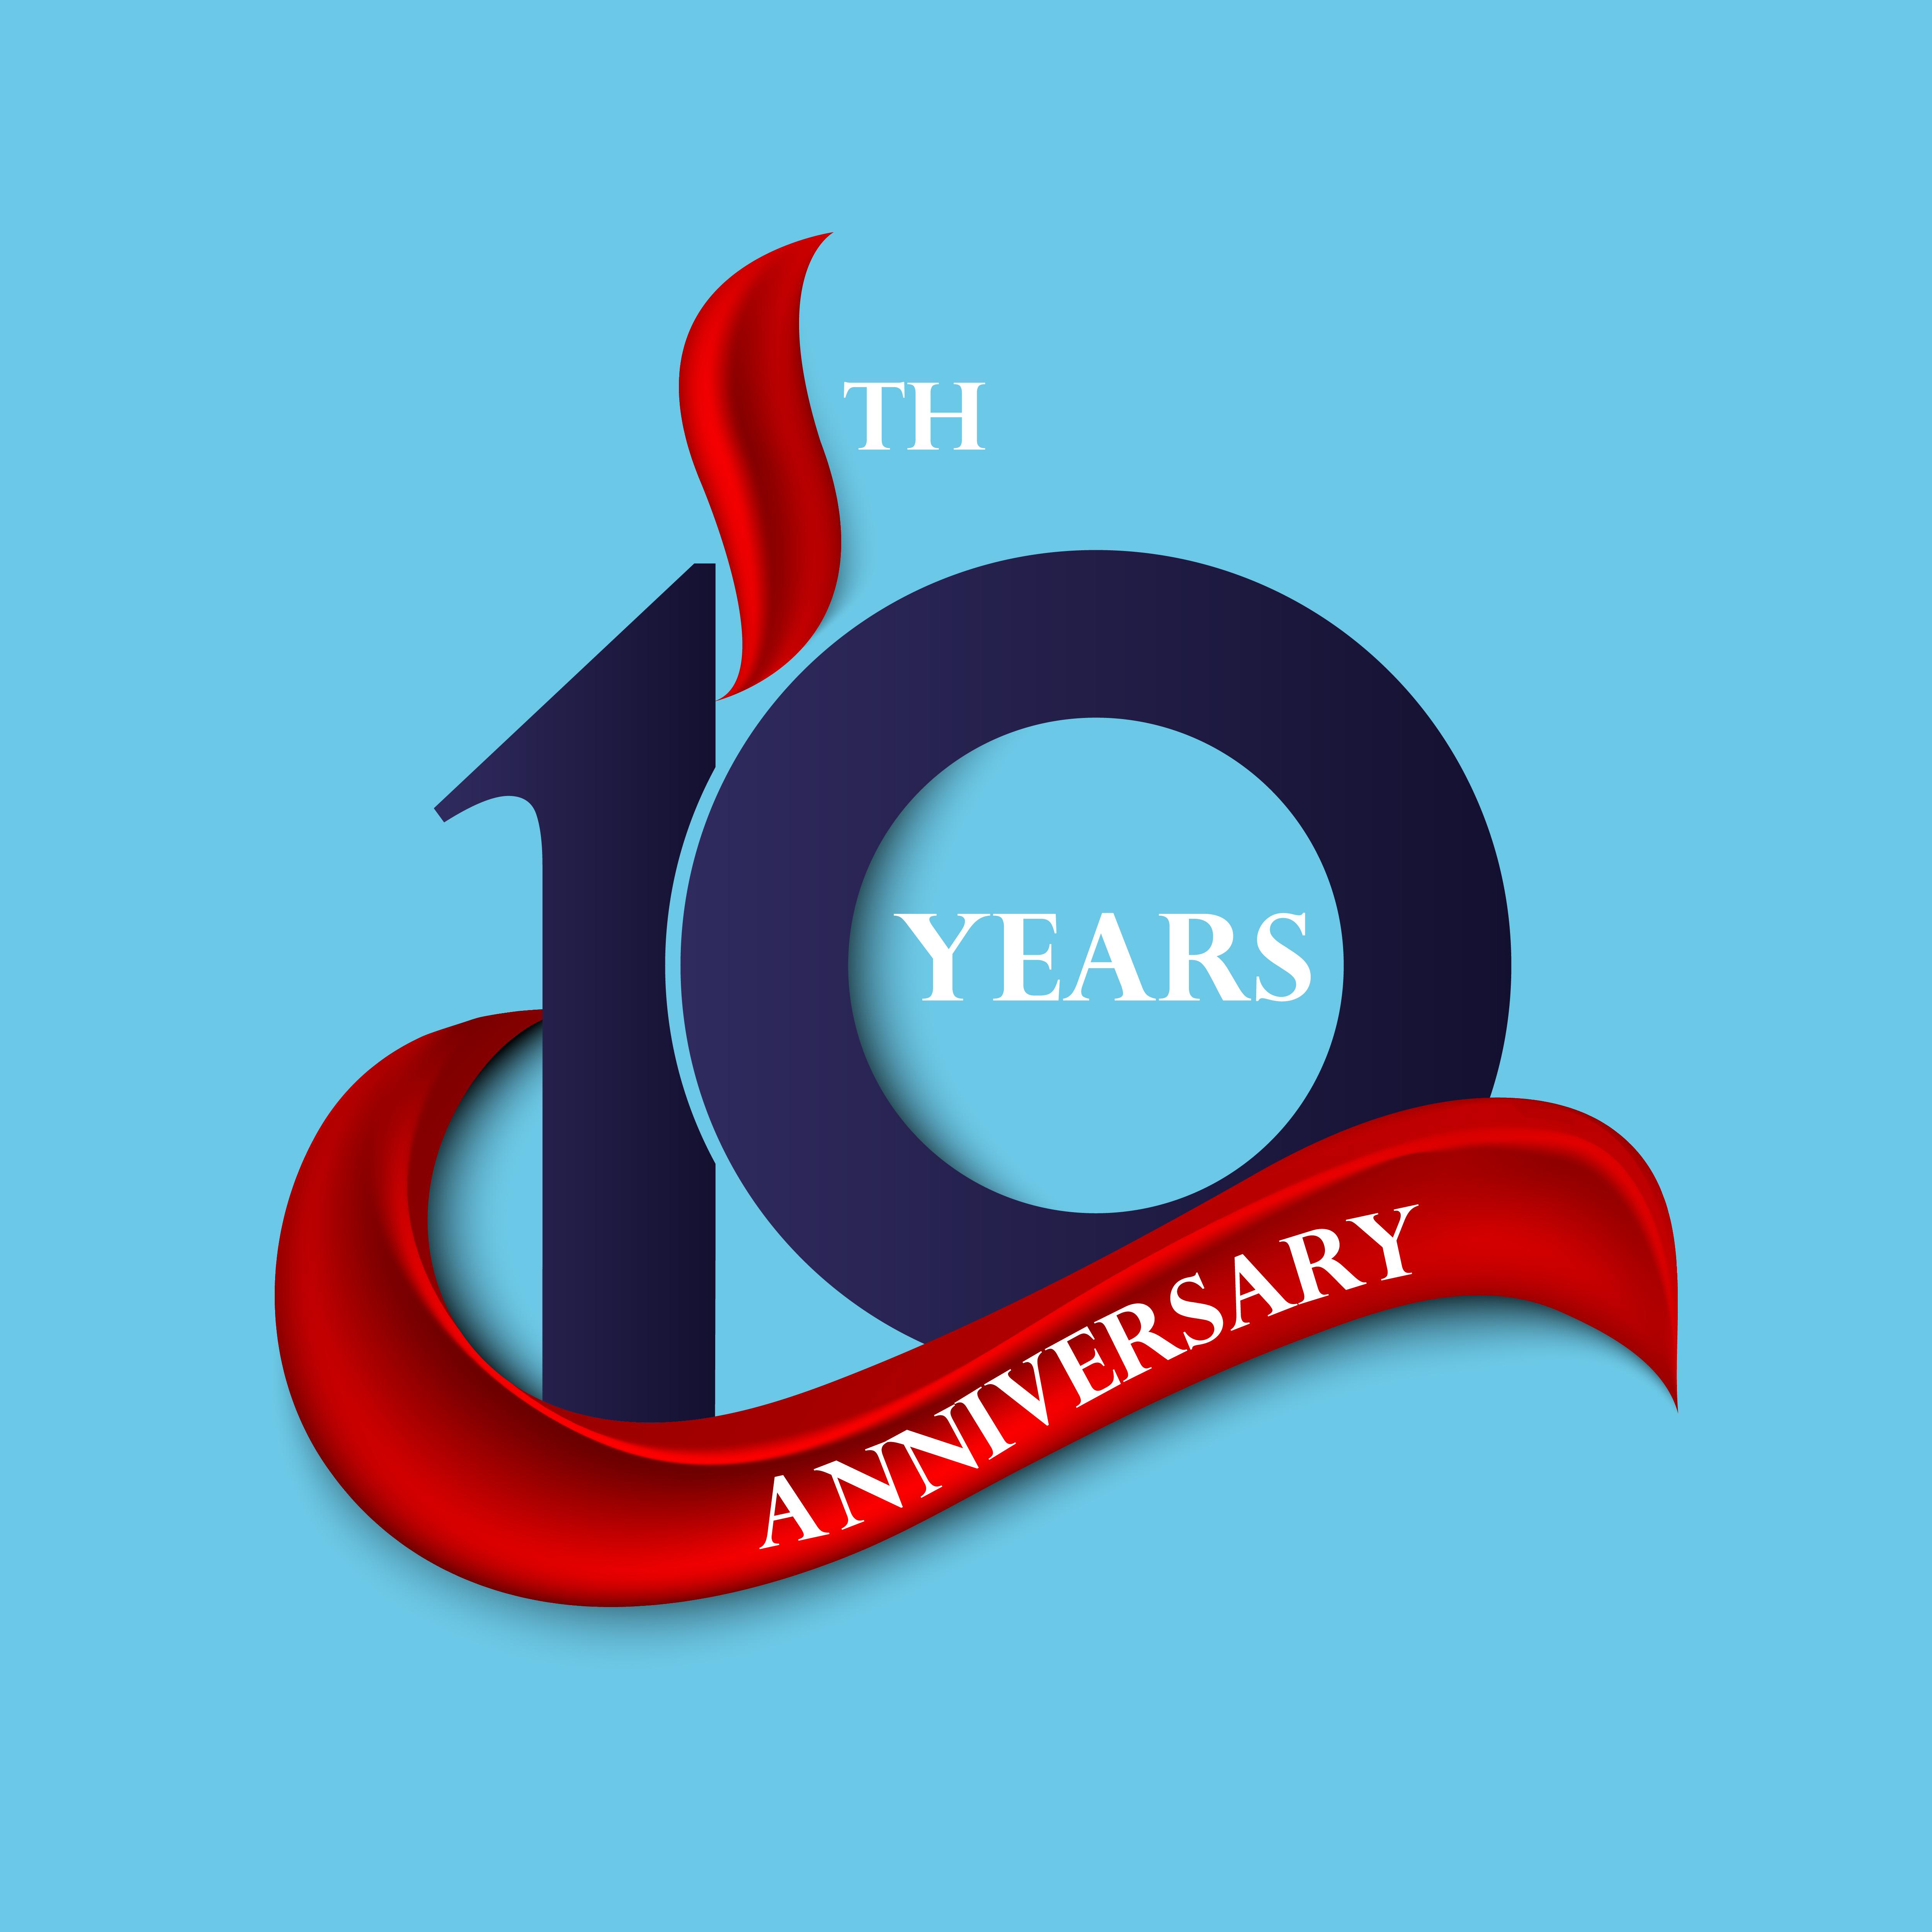 10th Anniversary Free Vector Art.